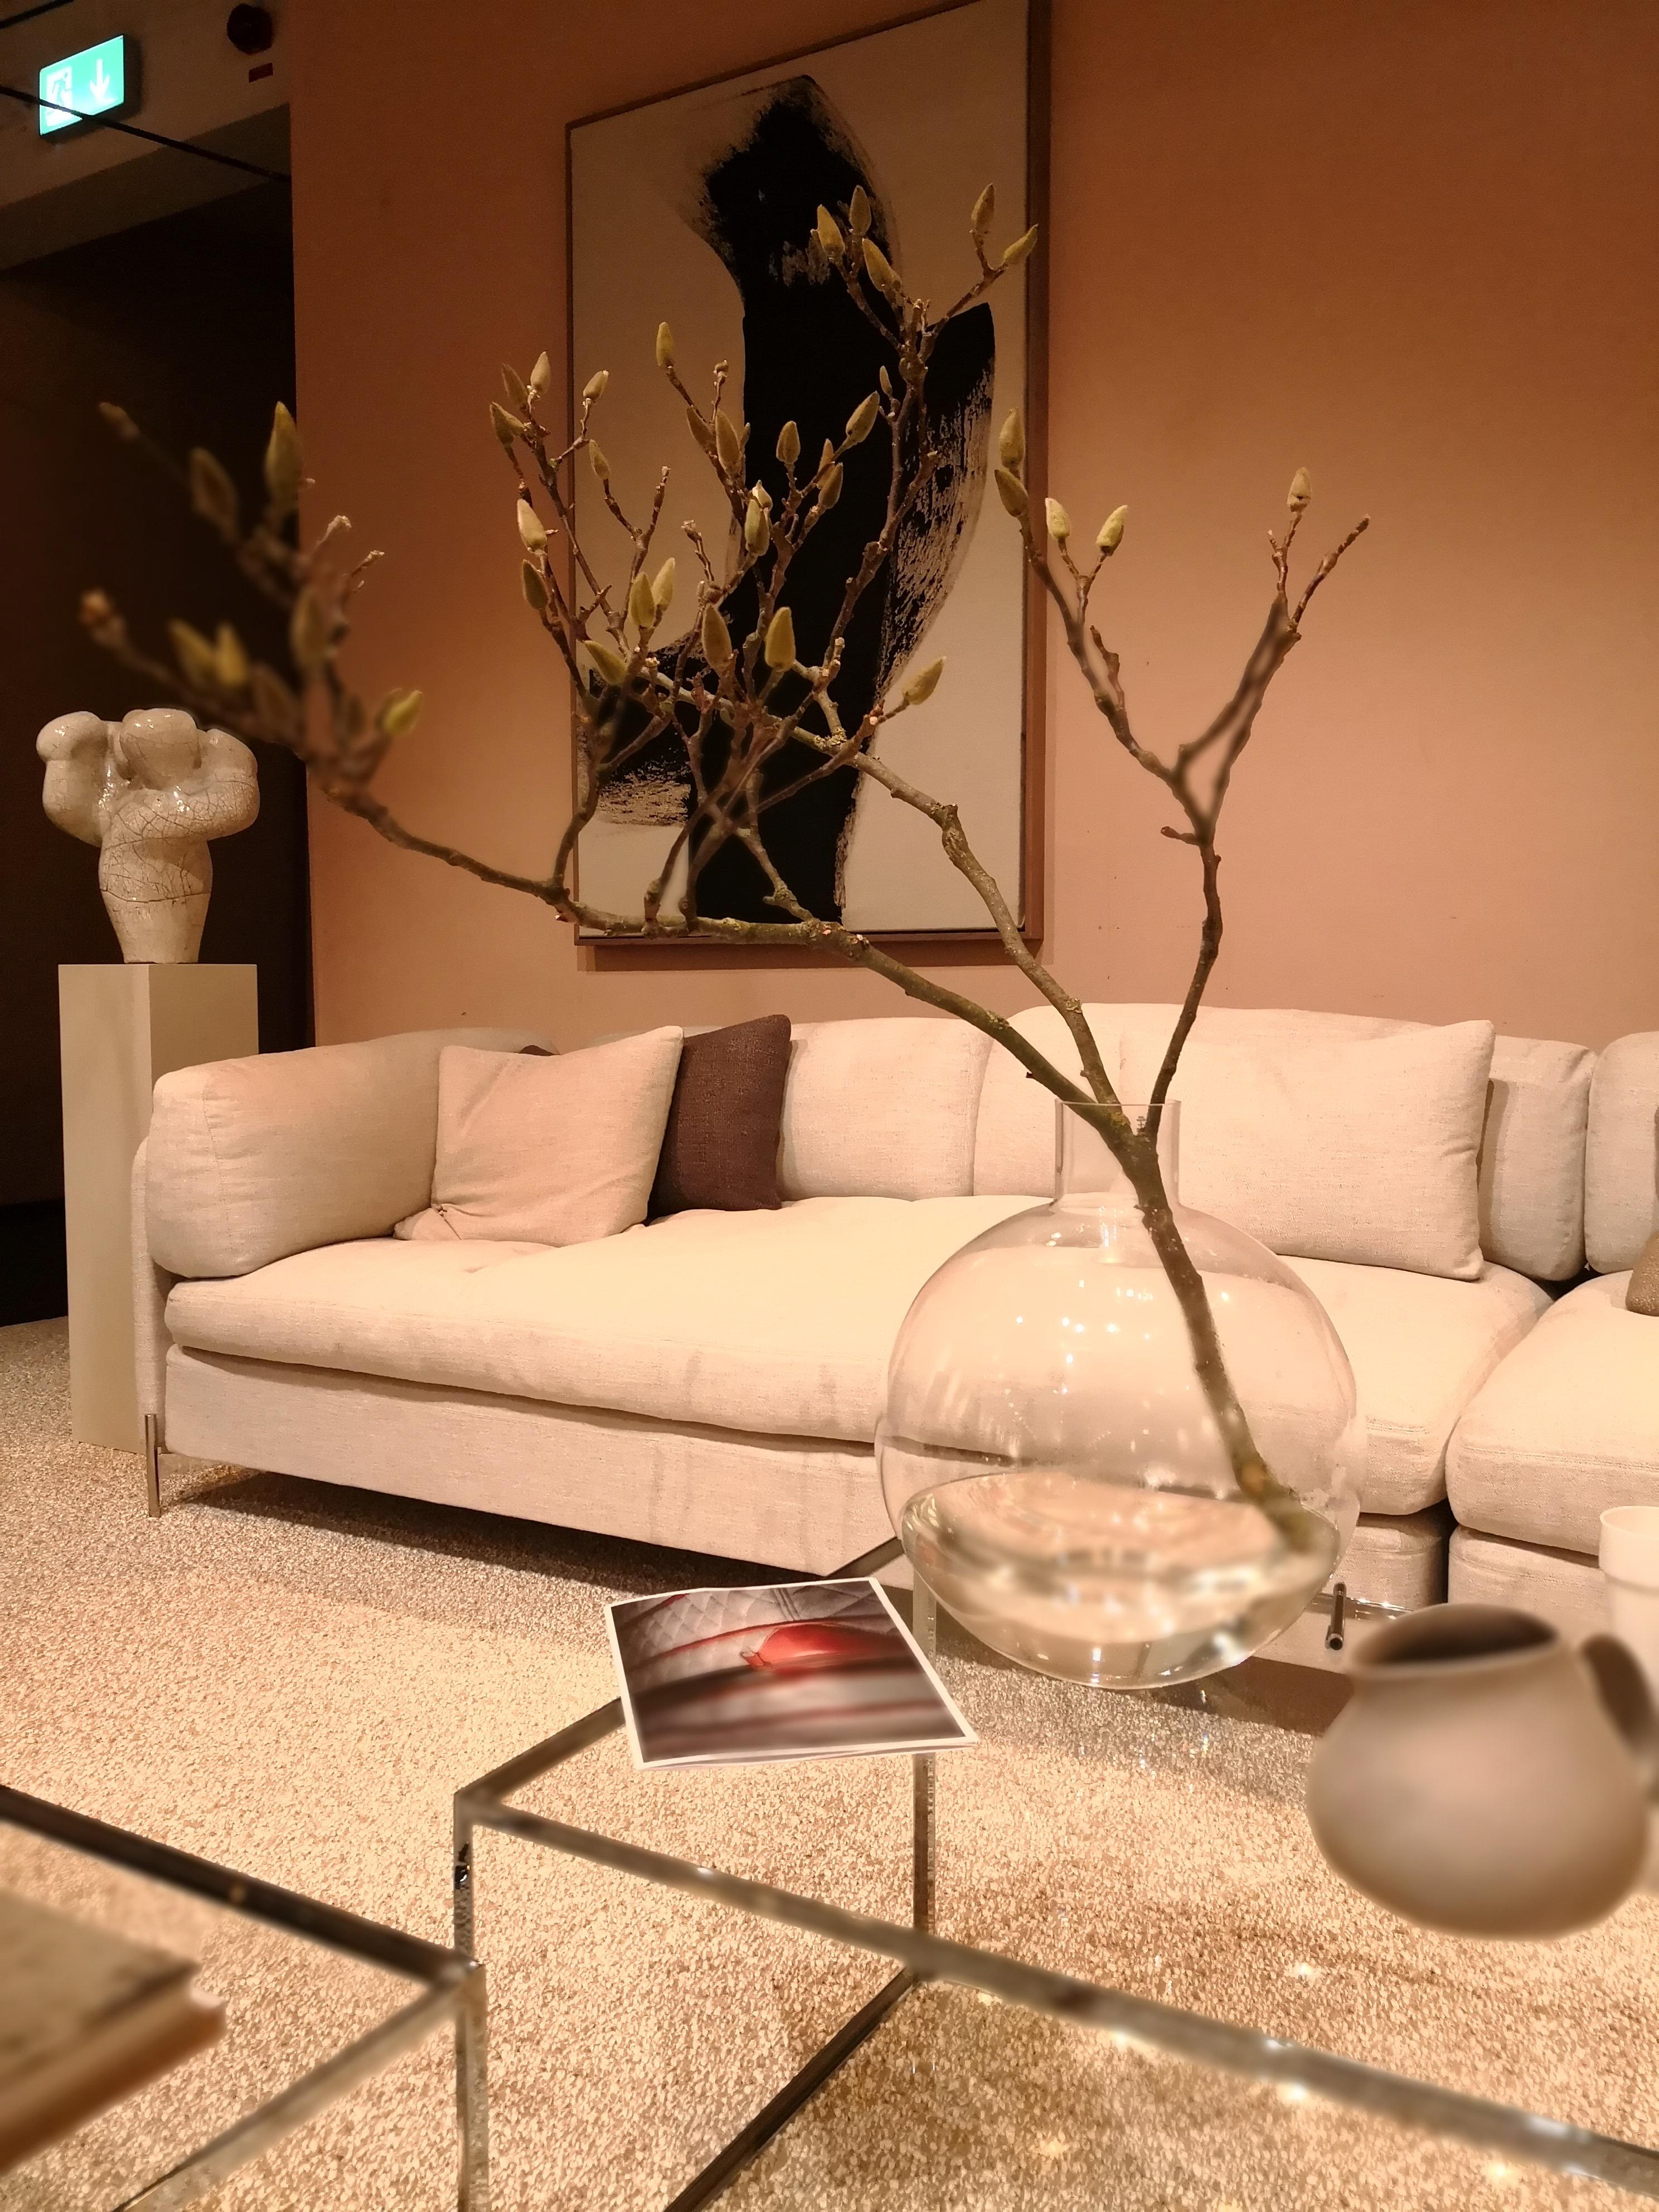 DUX viser sin nye sofa Alicia